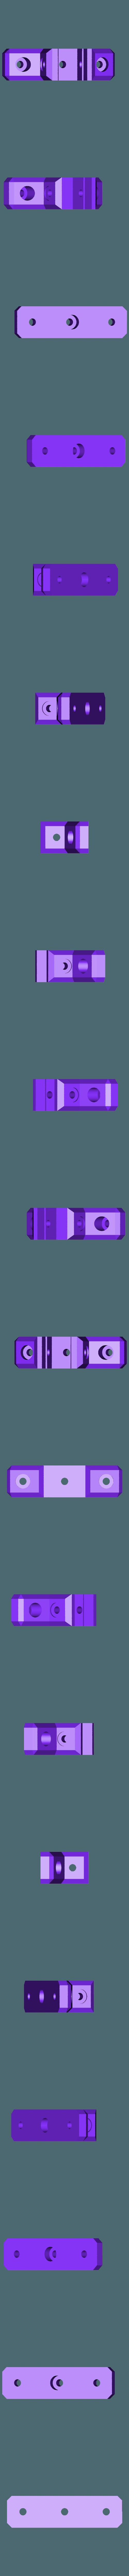 2020-Table-Bracket-C.stl Download free STL file 2020 Profile Aluminum 3D Printable Erector Set • 3D printer model, adamjvr